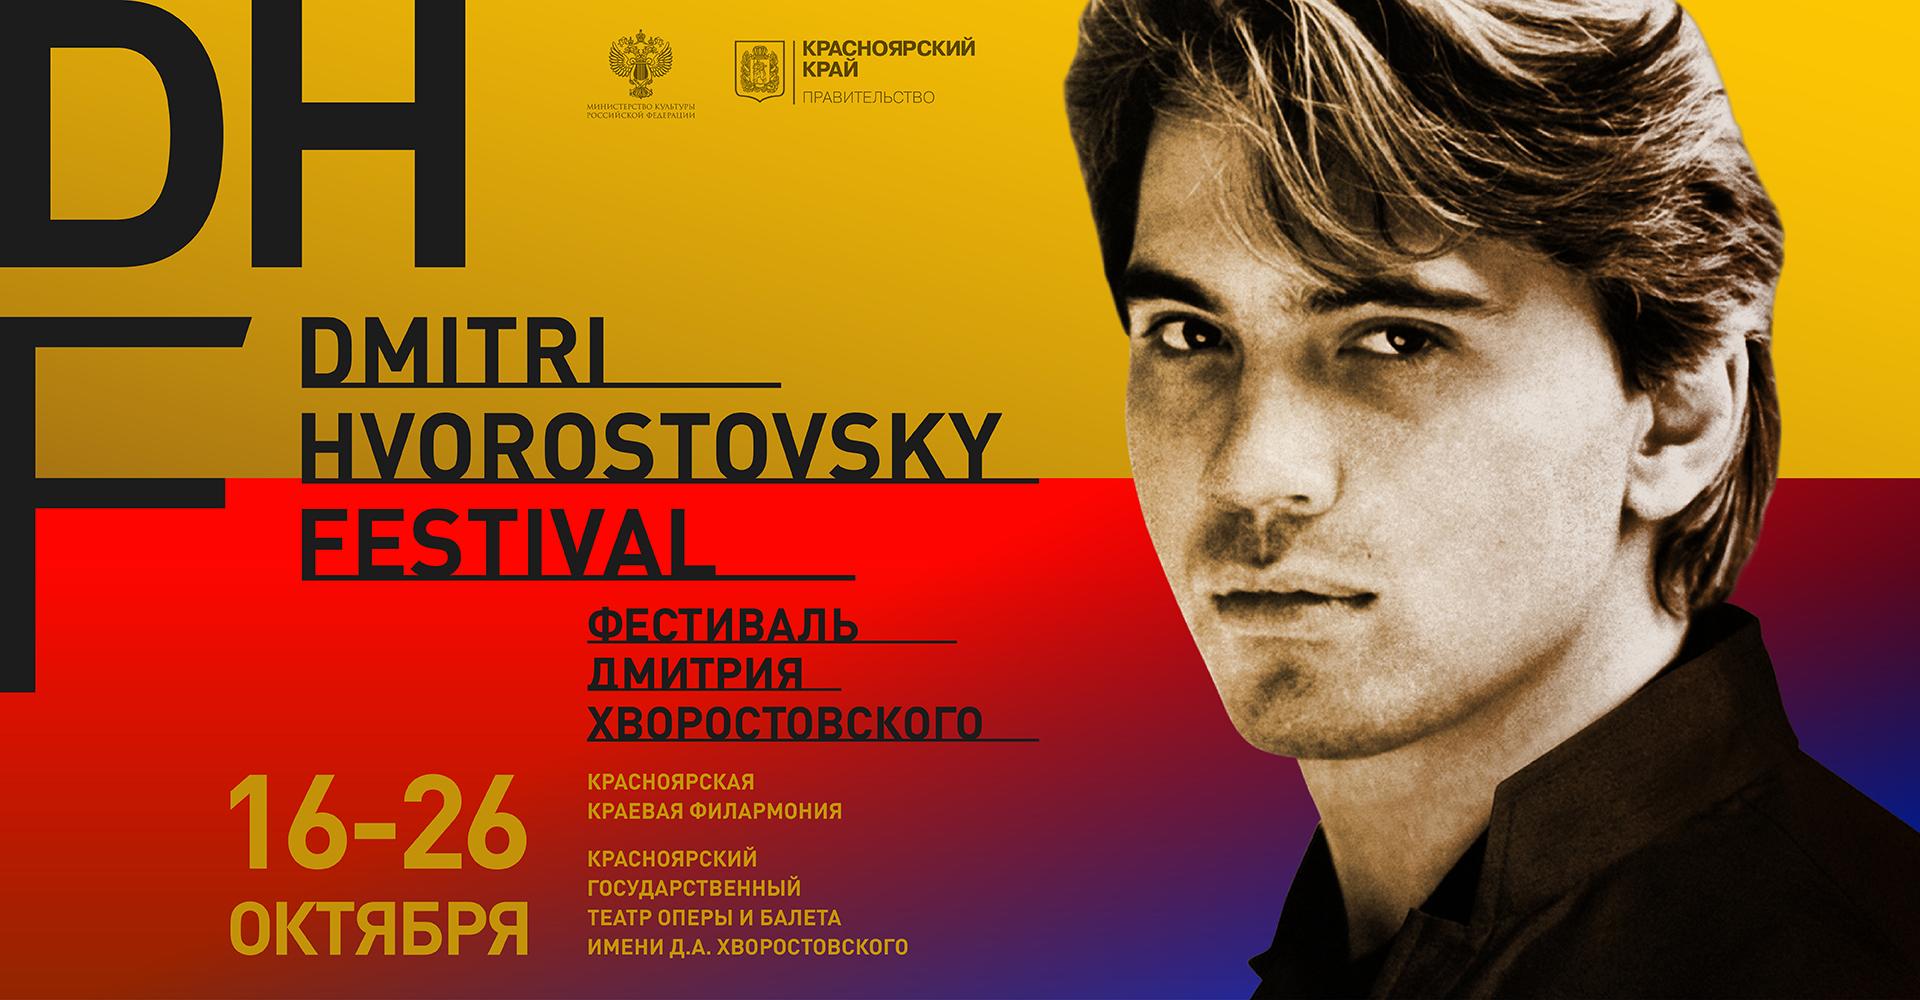 Фестиваль Дмитрия Хворостовского. Программа (16 - 26 октября)